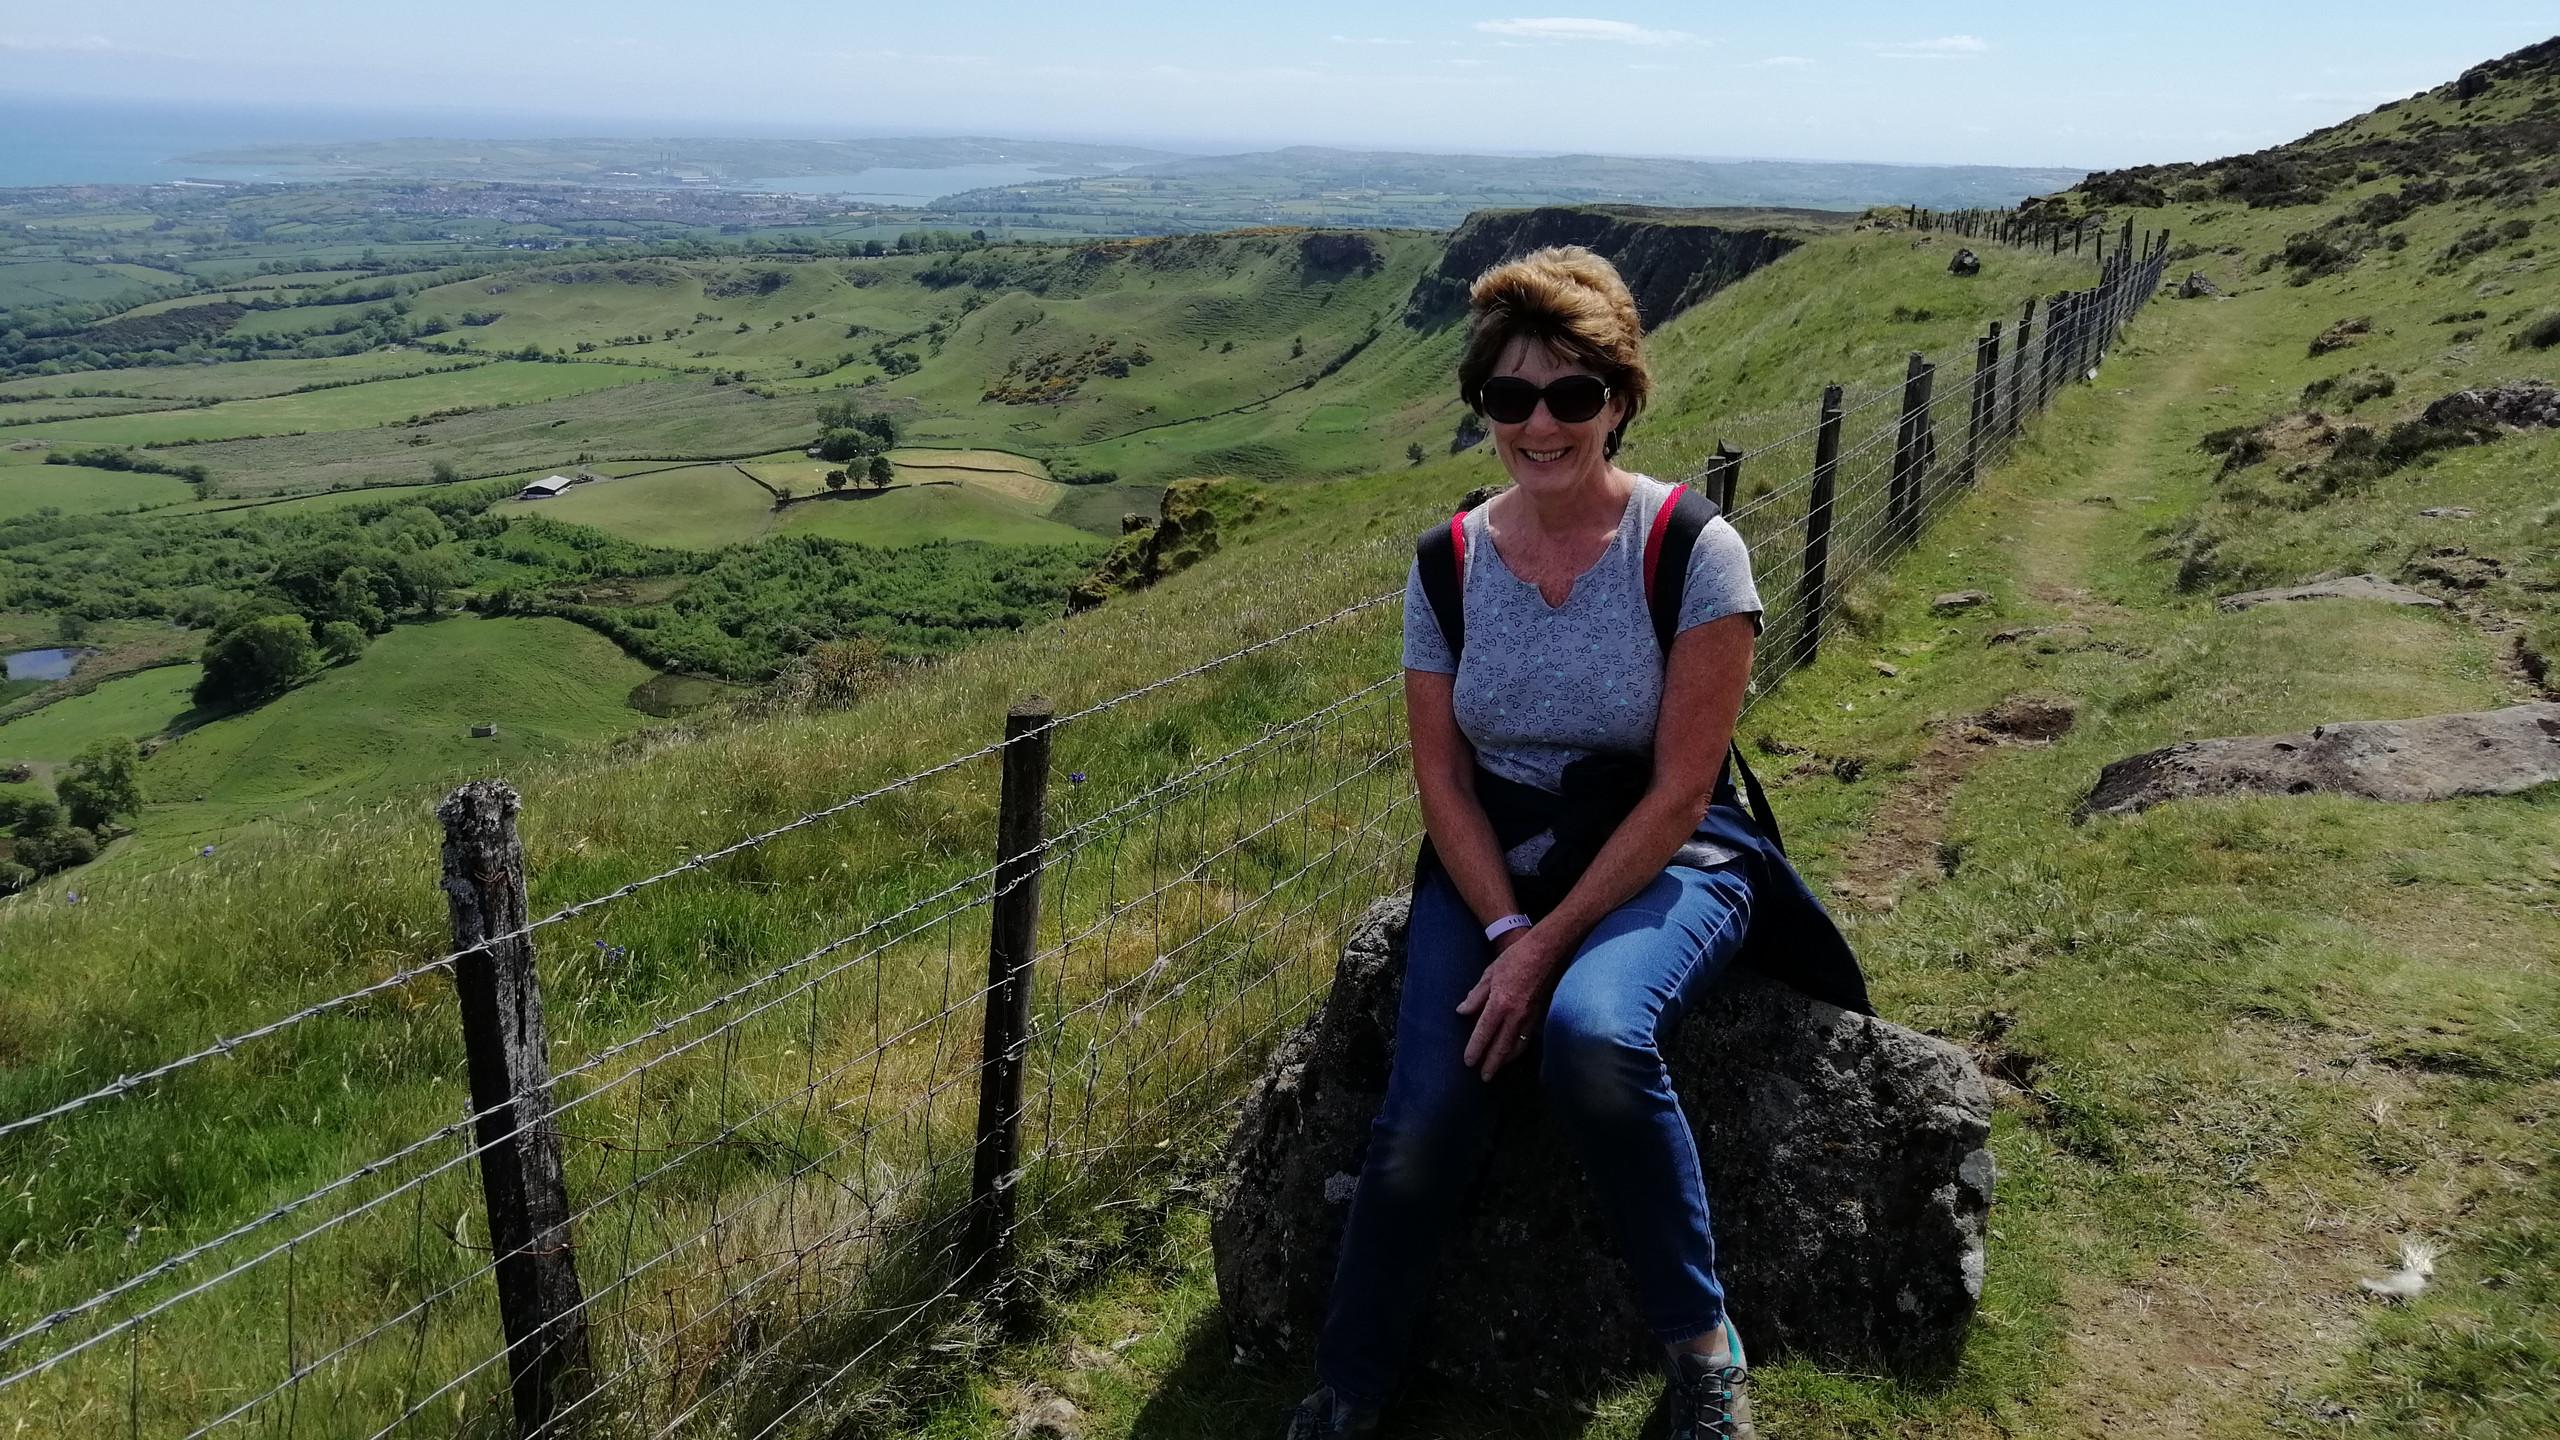 Dee on Sallagh Hill